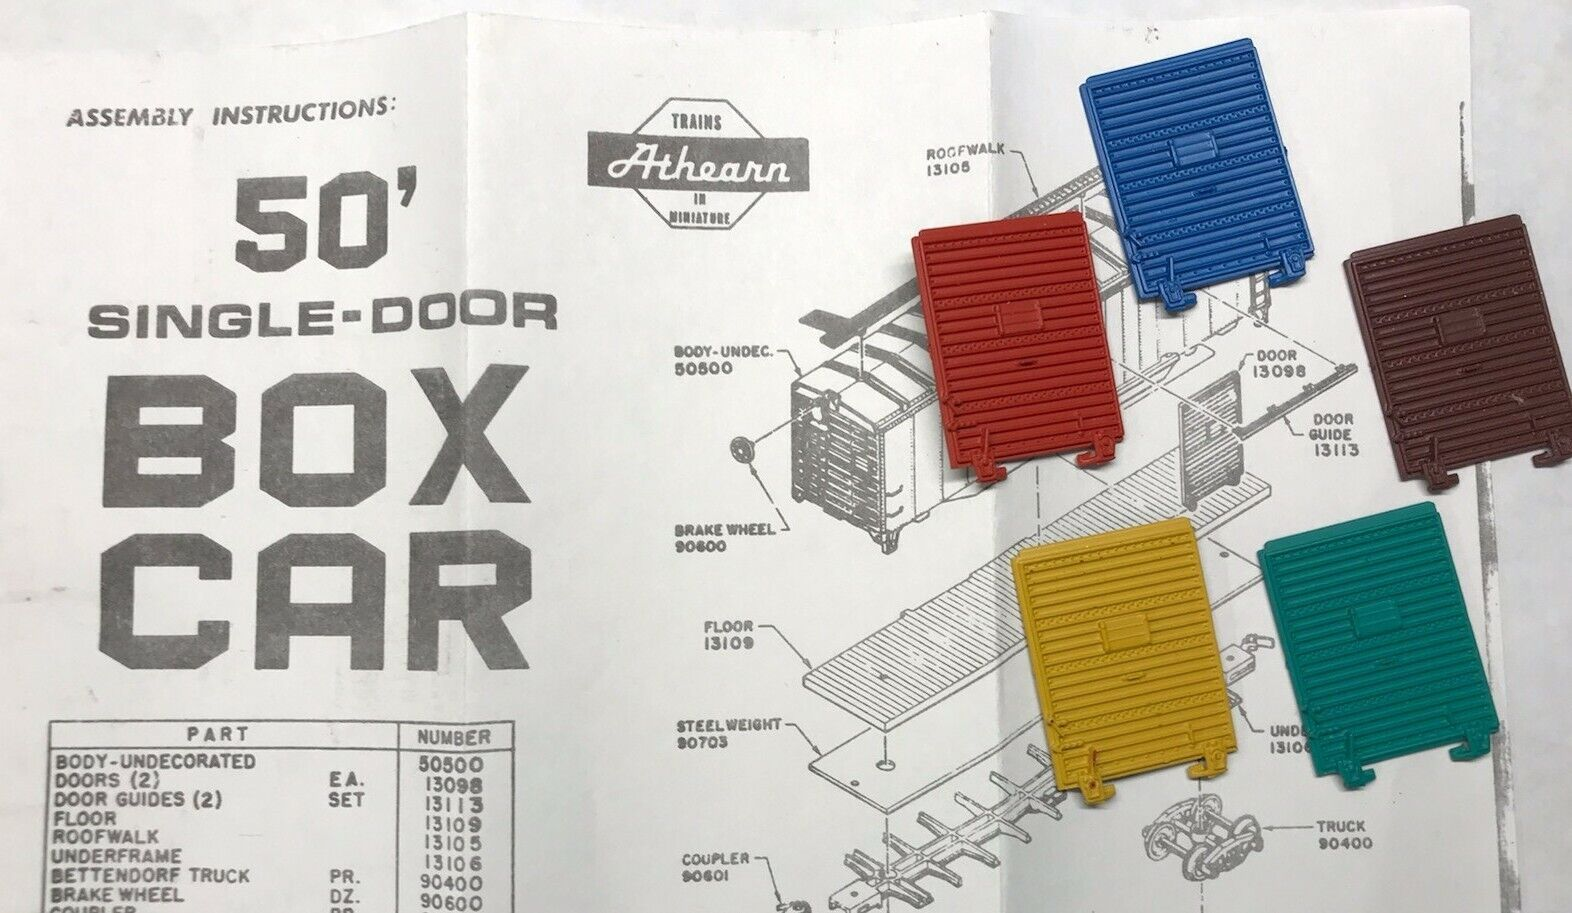 Car Parts - Athearn HO 50' Box Car Parts - Part #13098 - 1 Pair of Doors - CHOOSE COLOR! NEW